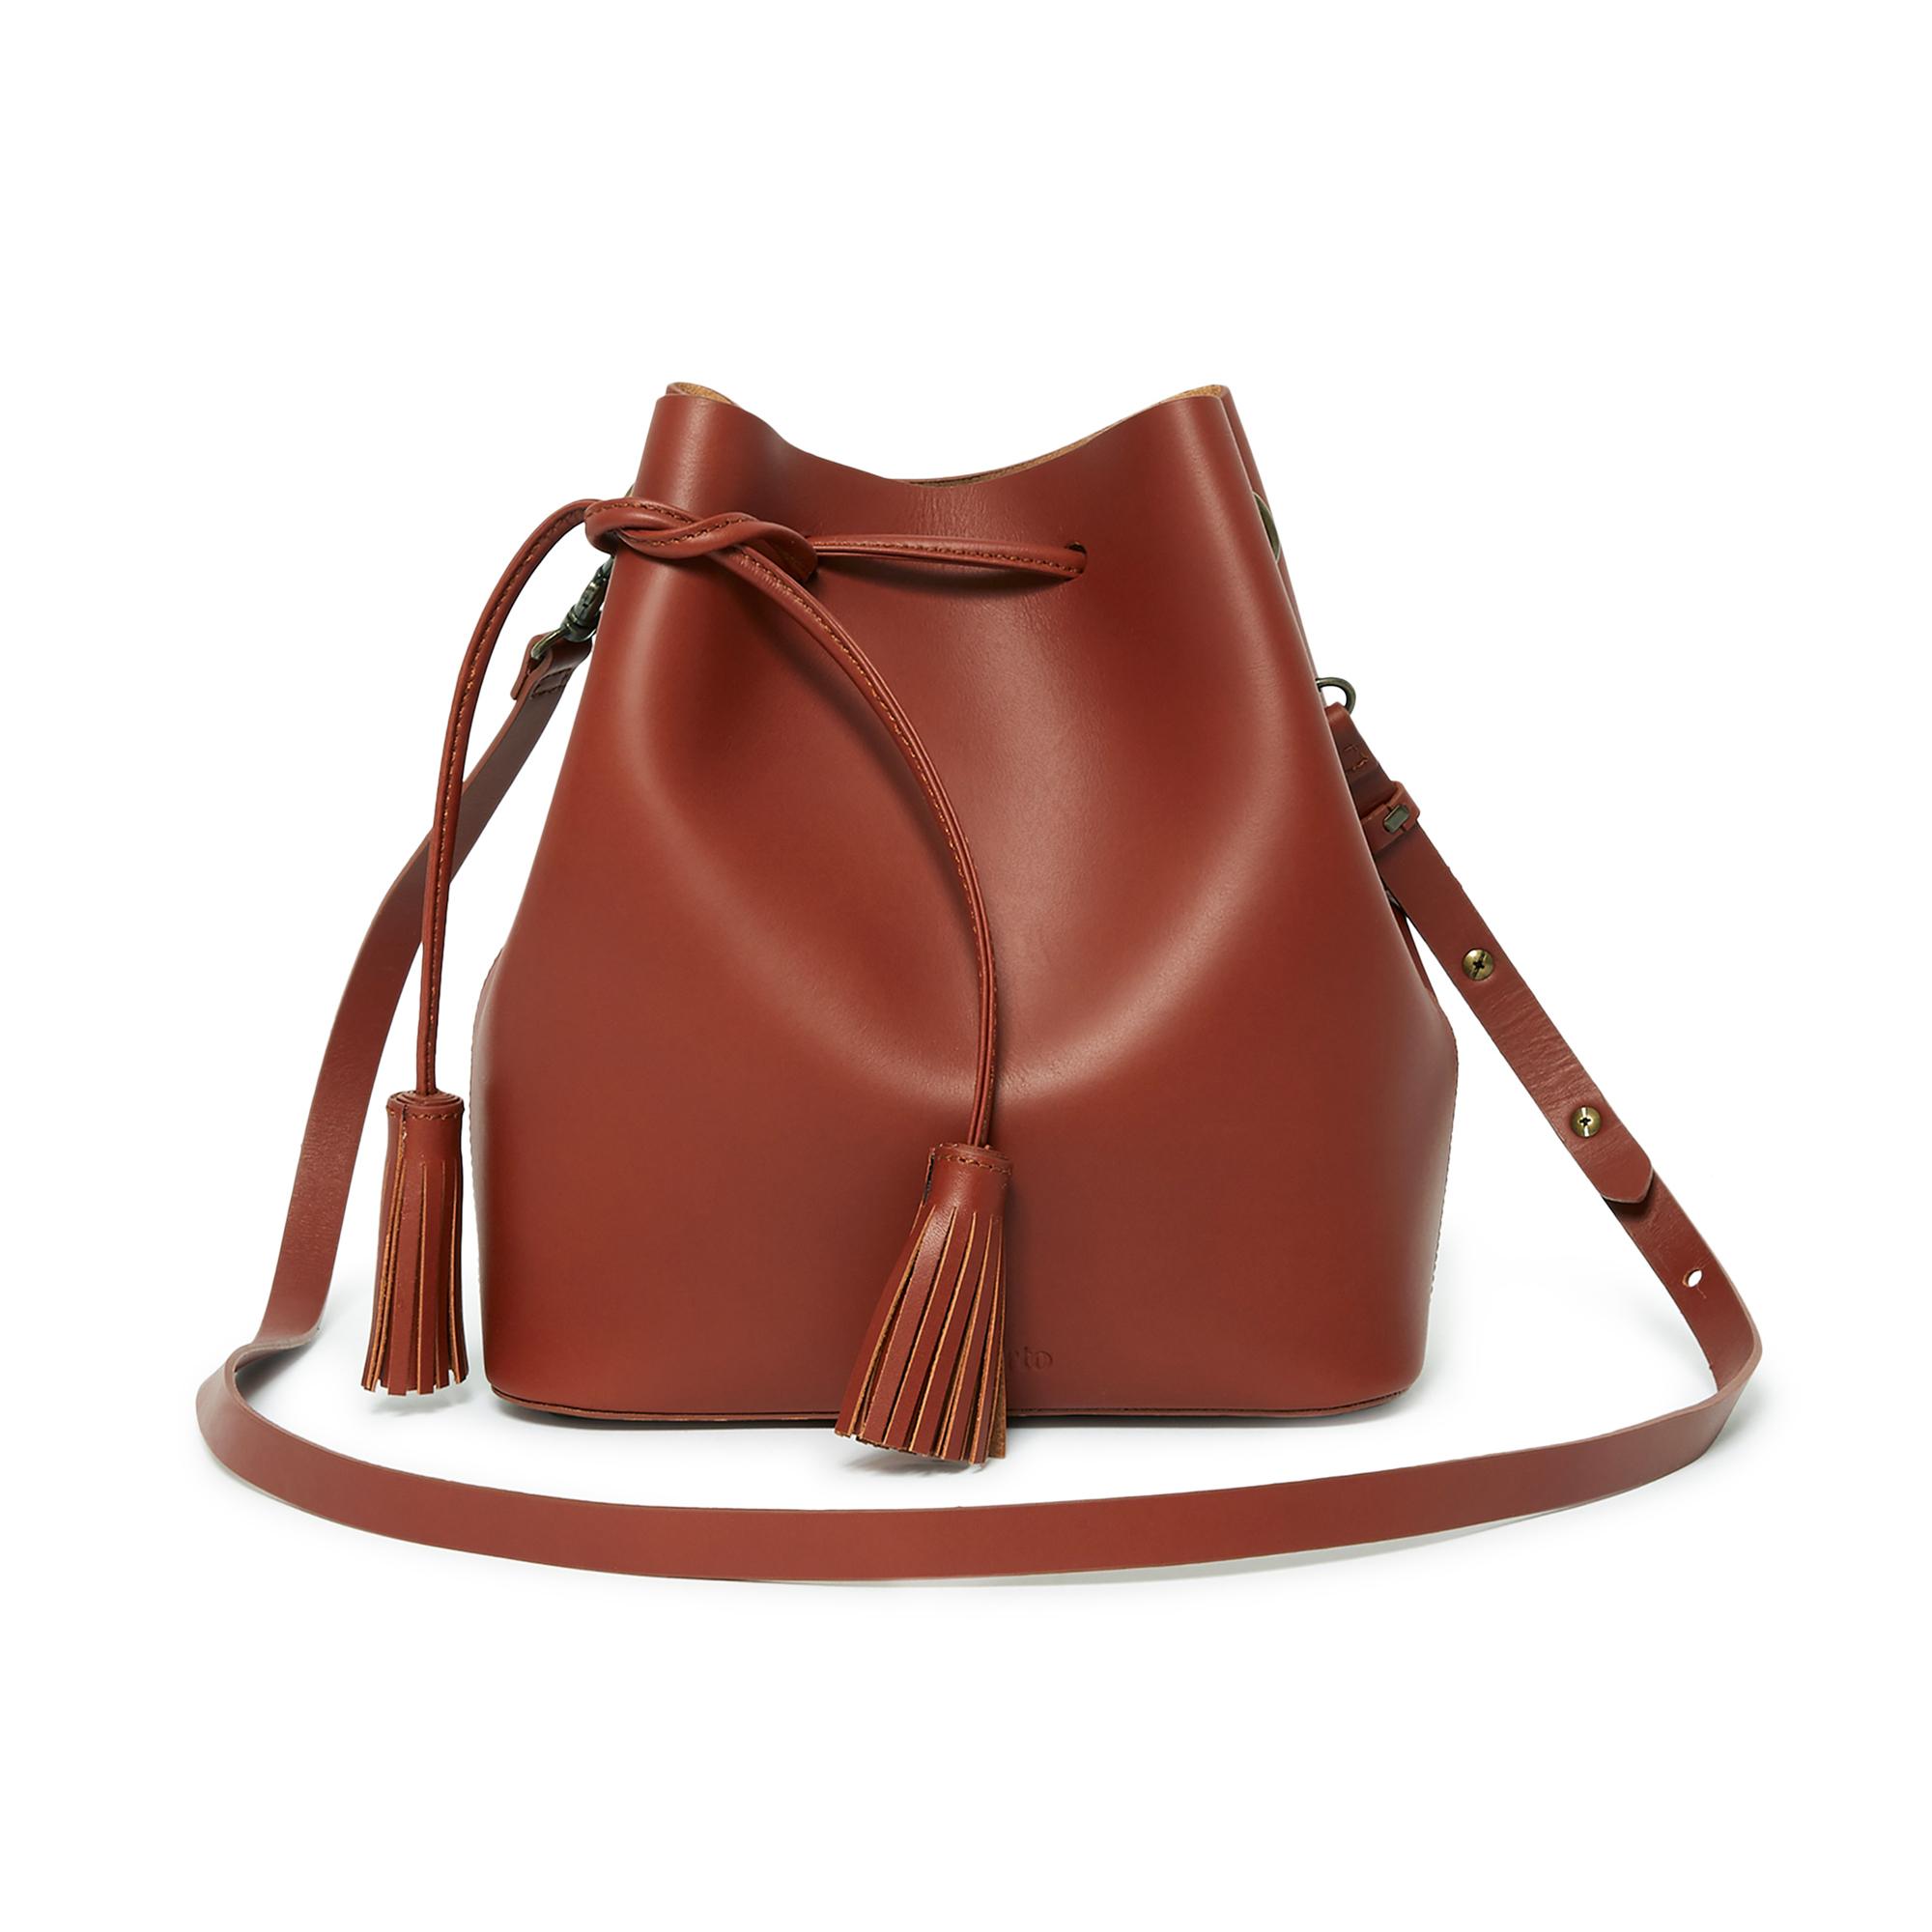 d437badeff62 Dita bag Brown Vereverto Fashion Adult. «